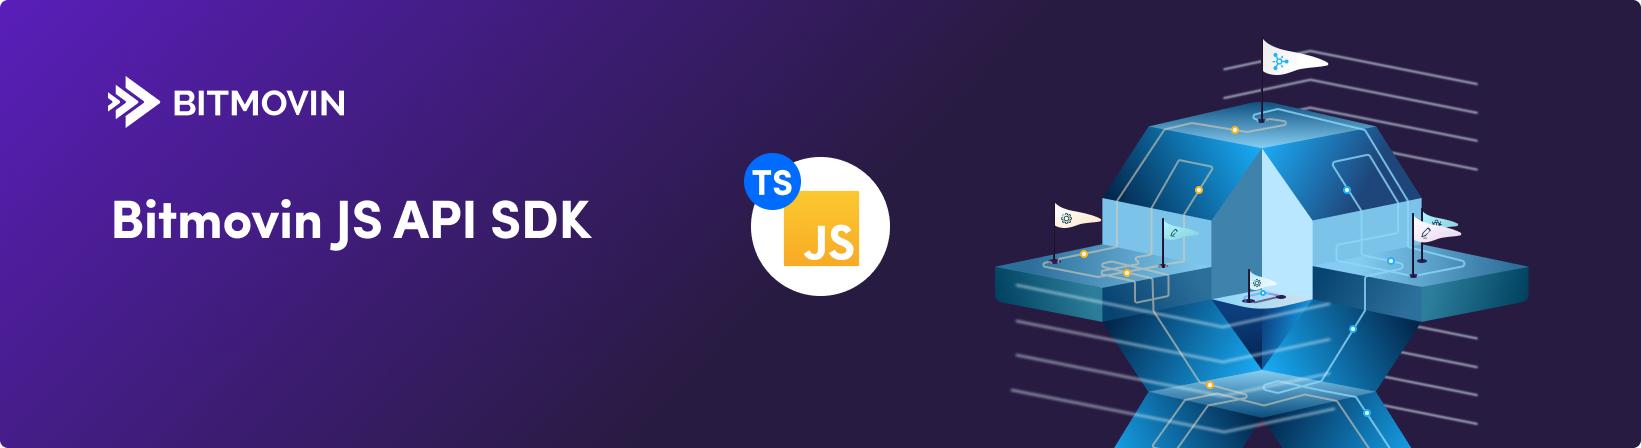 Bitmovin TypeScript/JavaScript API SDK Header